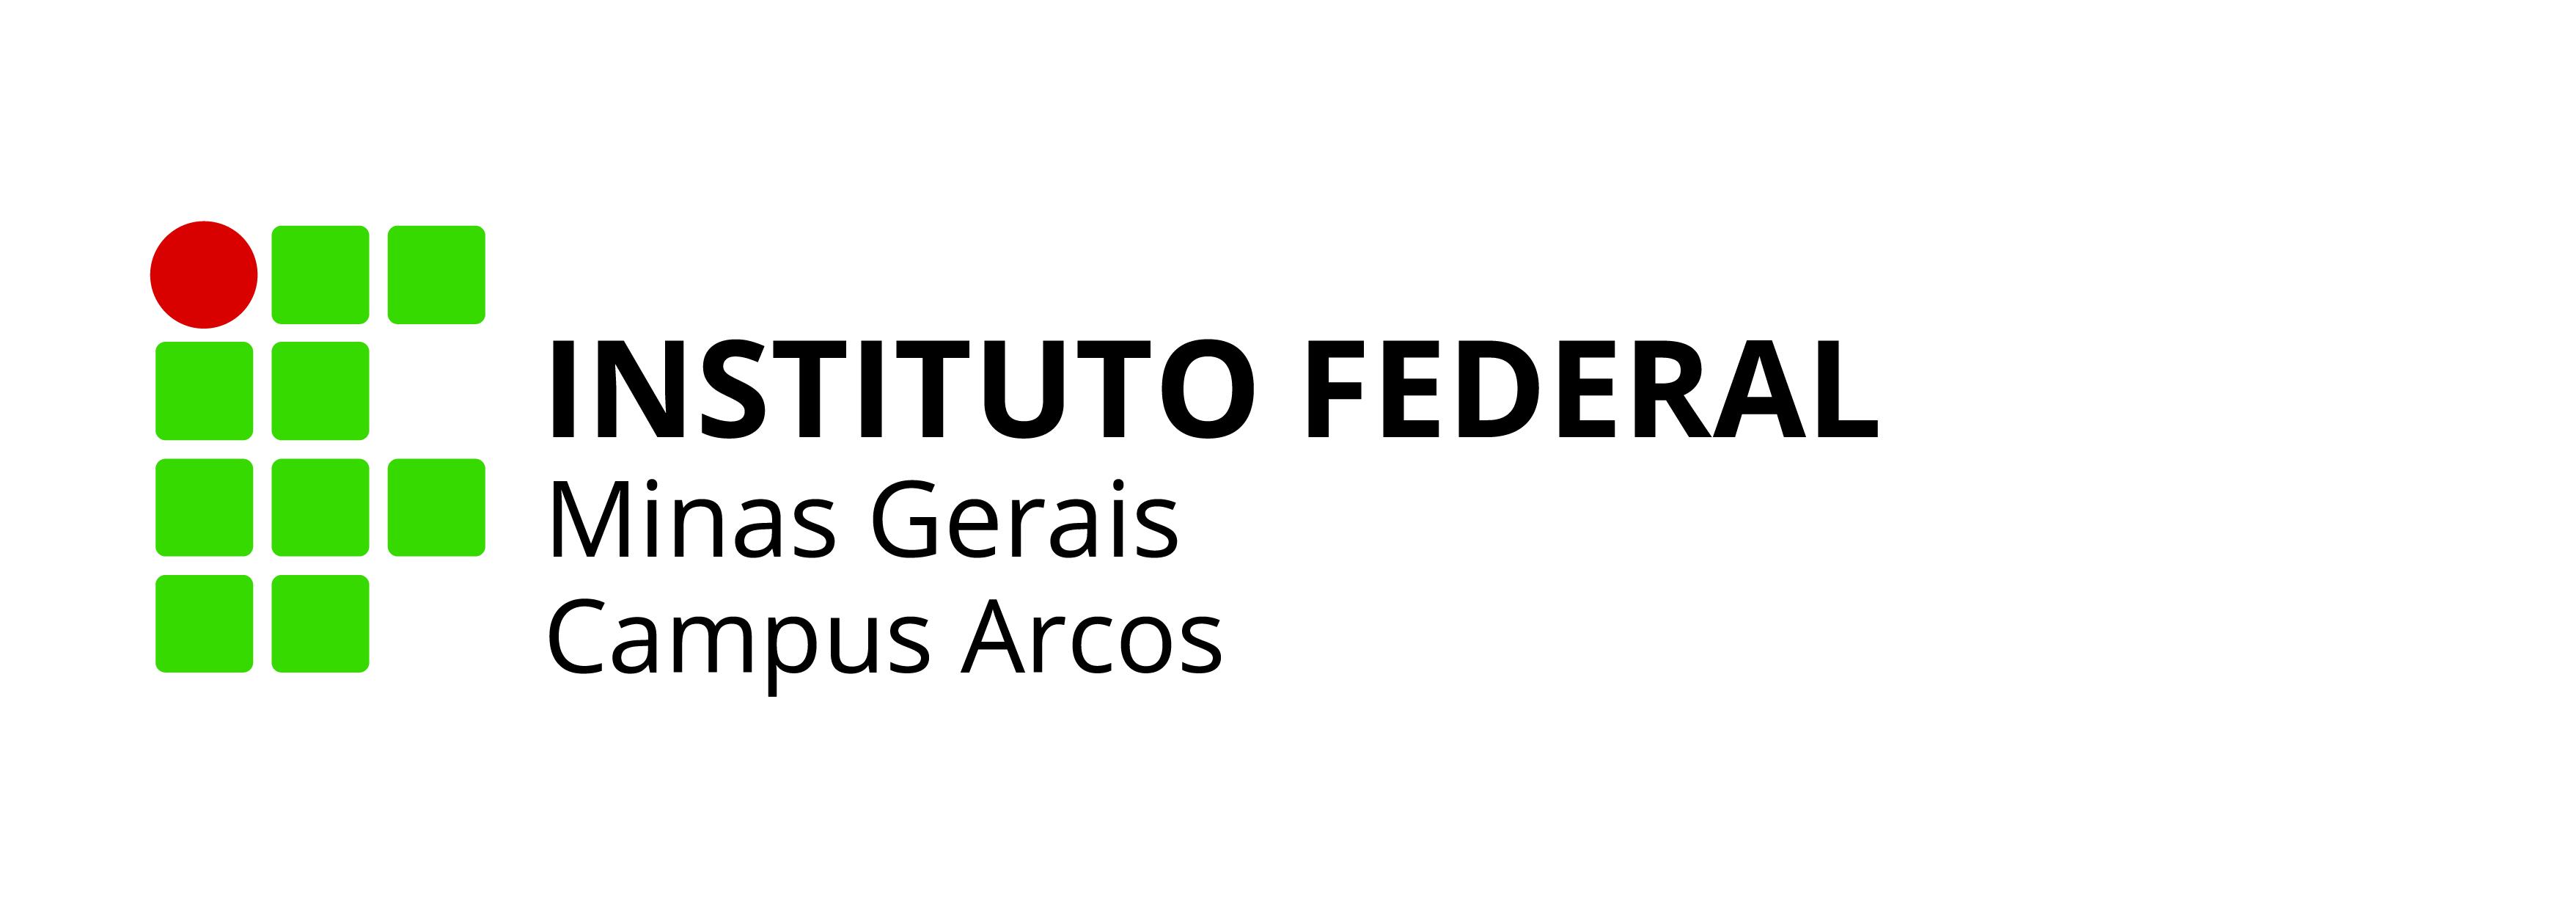 IFMG_Arcos_Horizontal.jpg